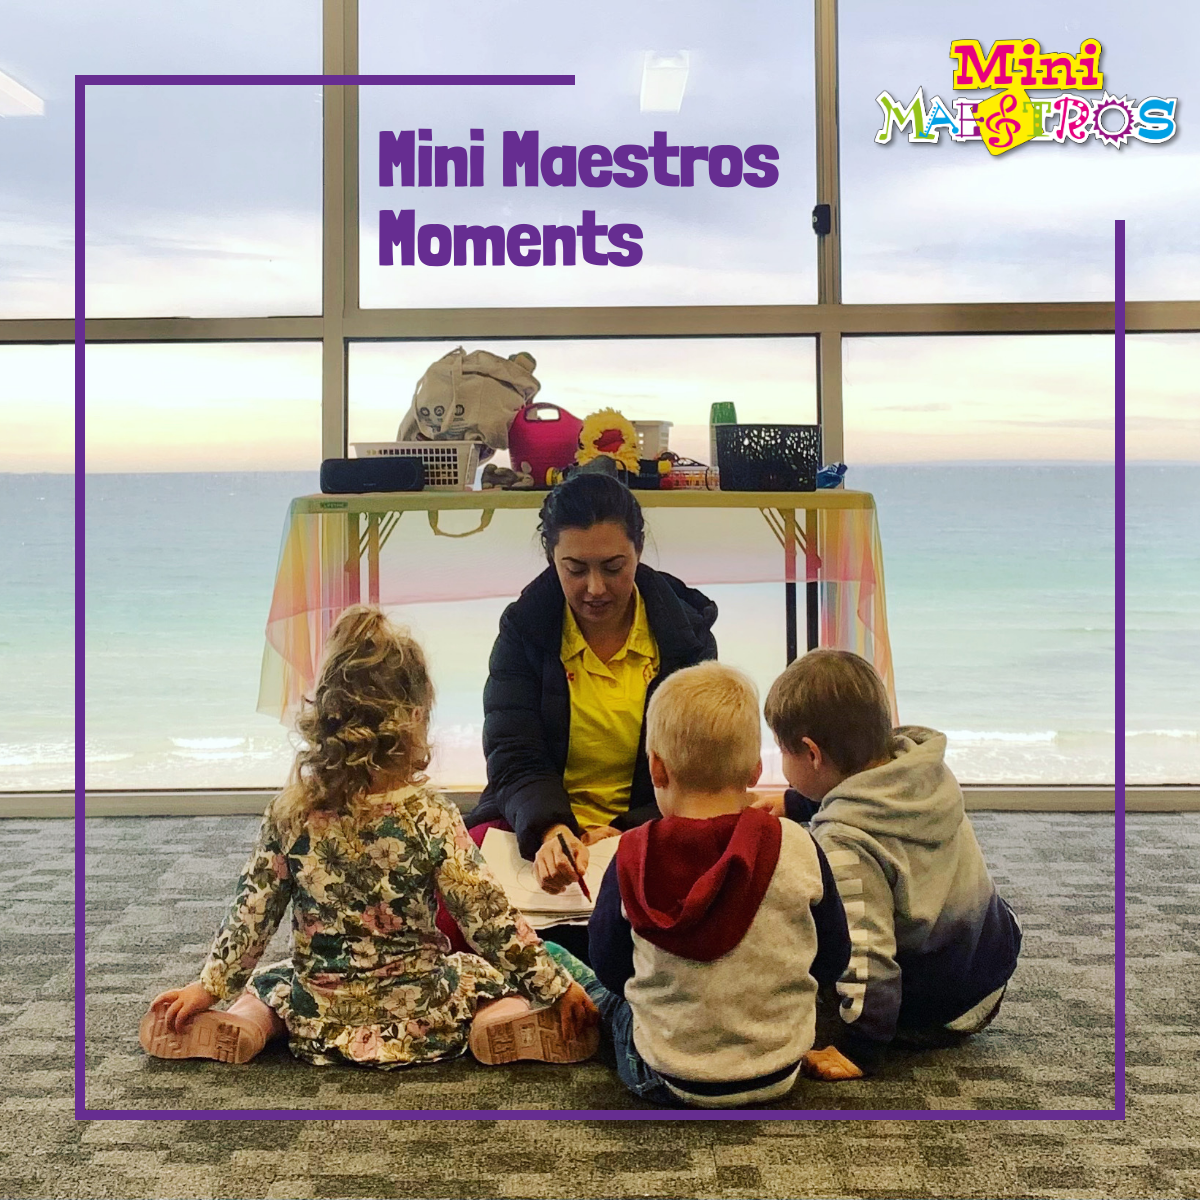 Mini Maestros Moments